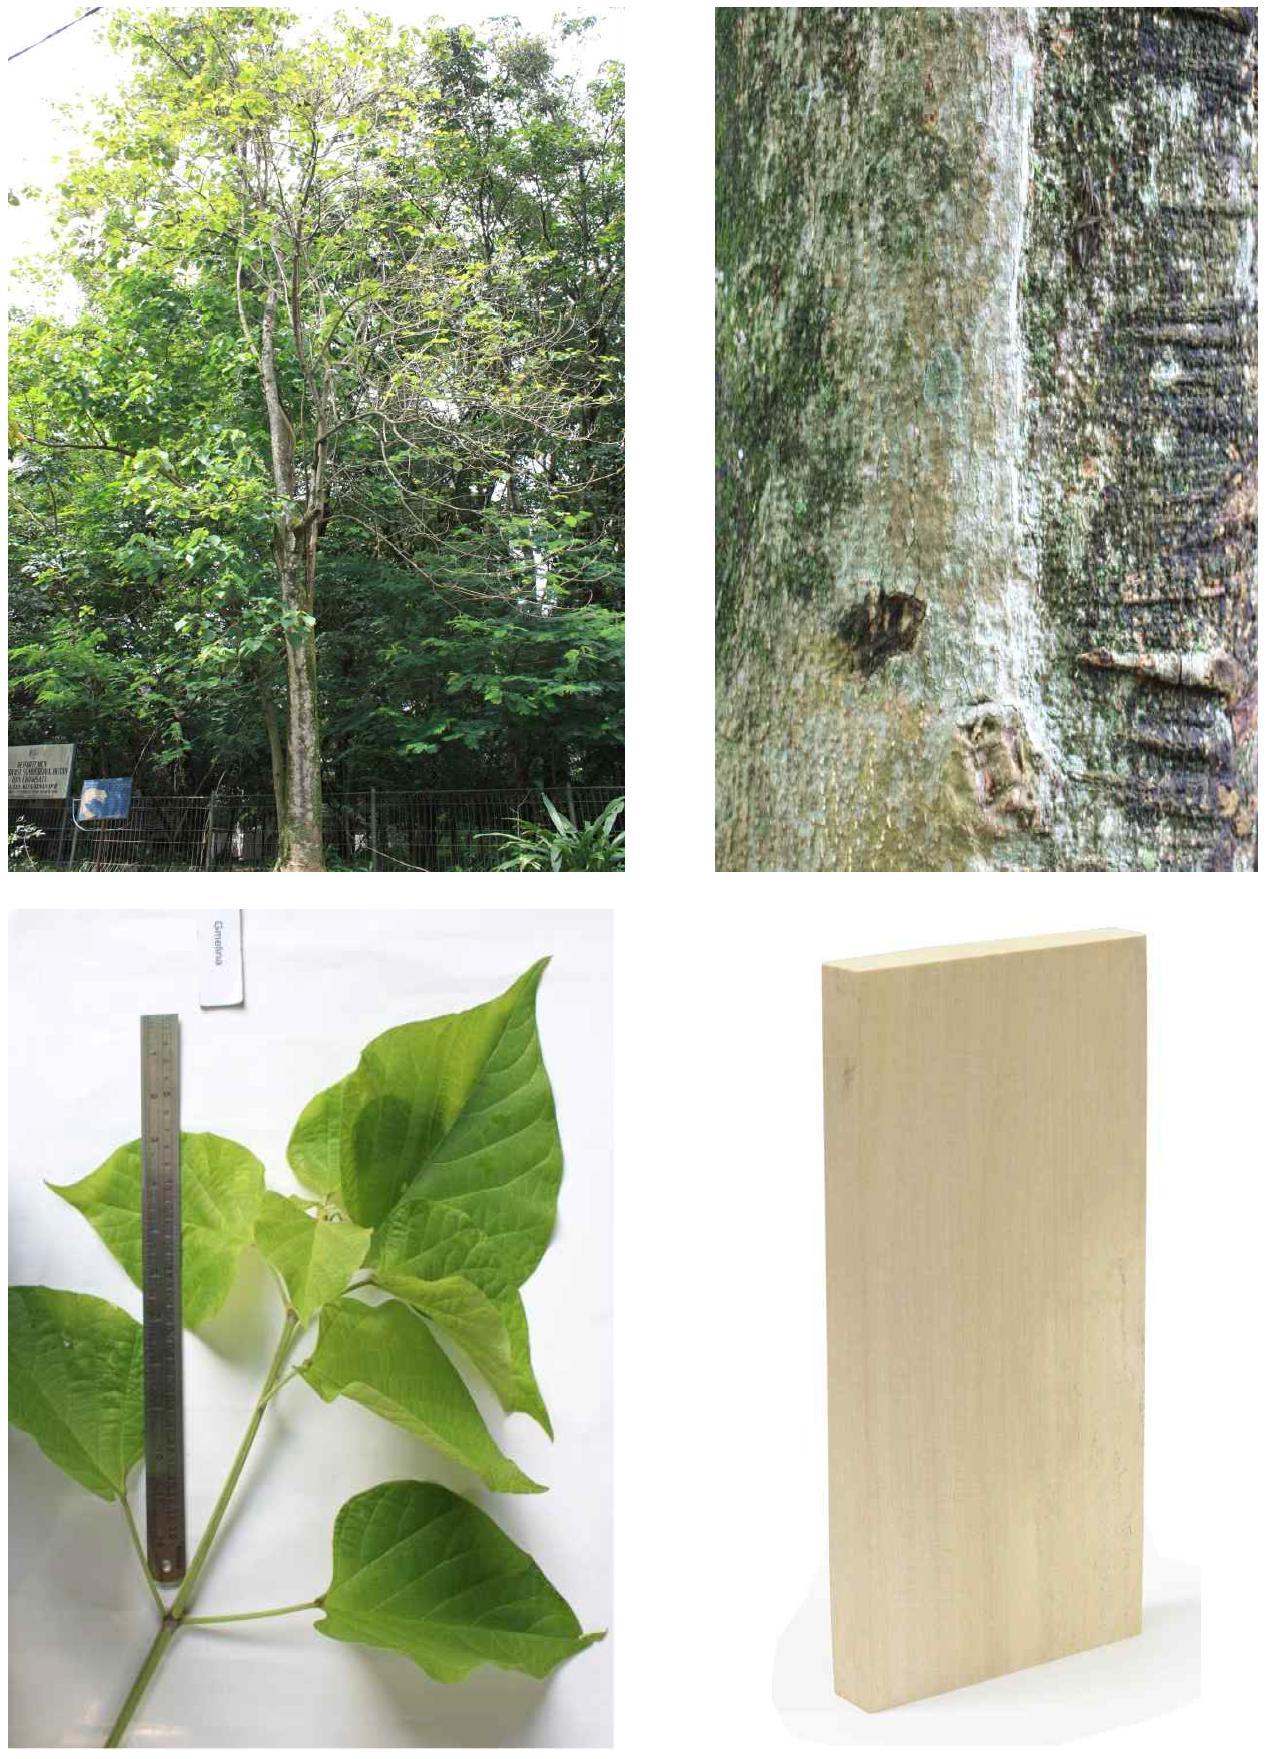 Gmelina의 전체수형, 수피, 잎 및 재면.